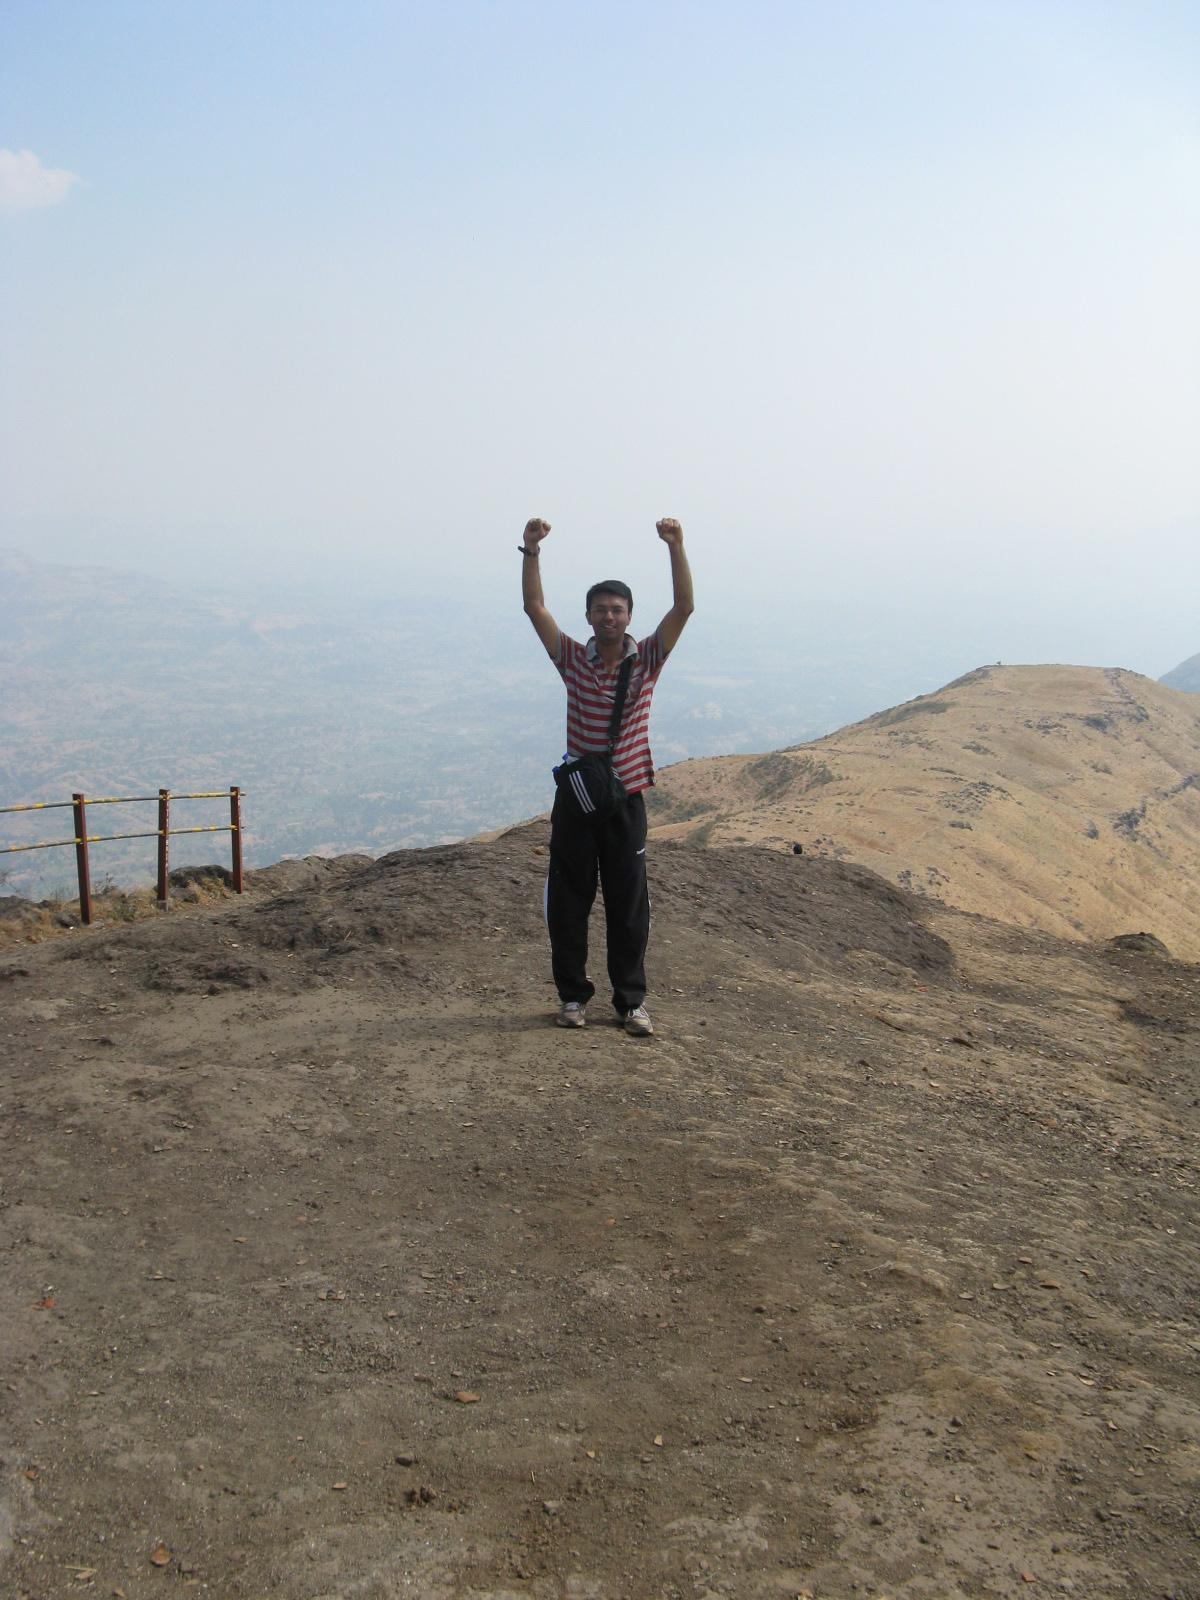 kite day in maharashtra